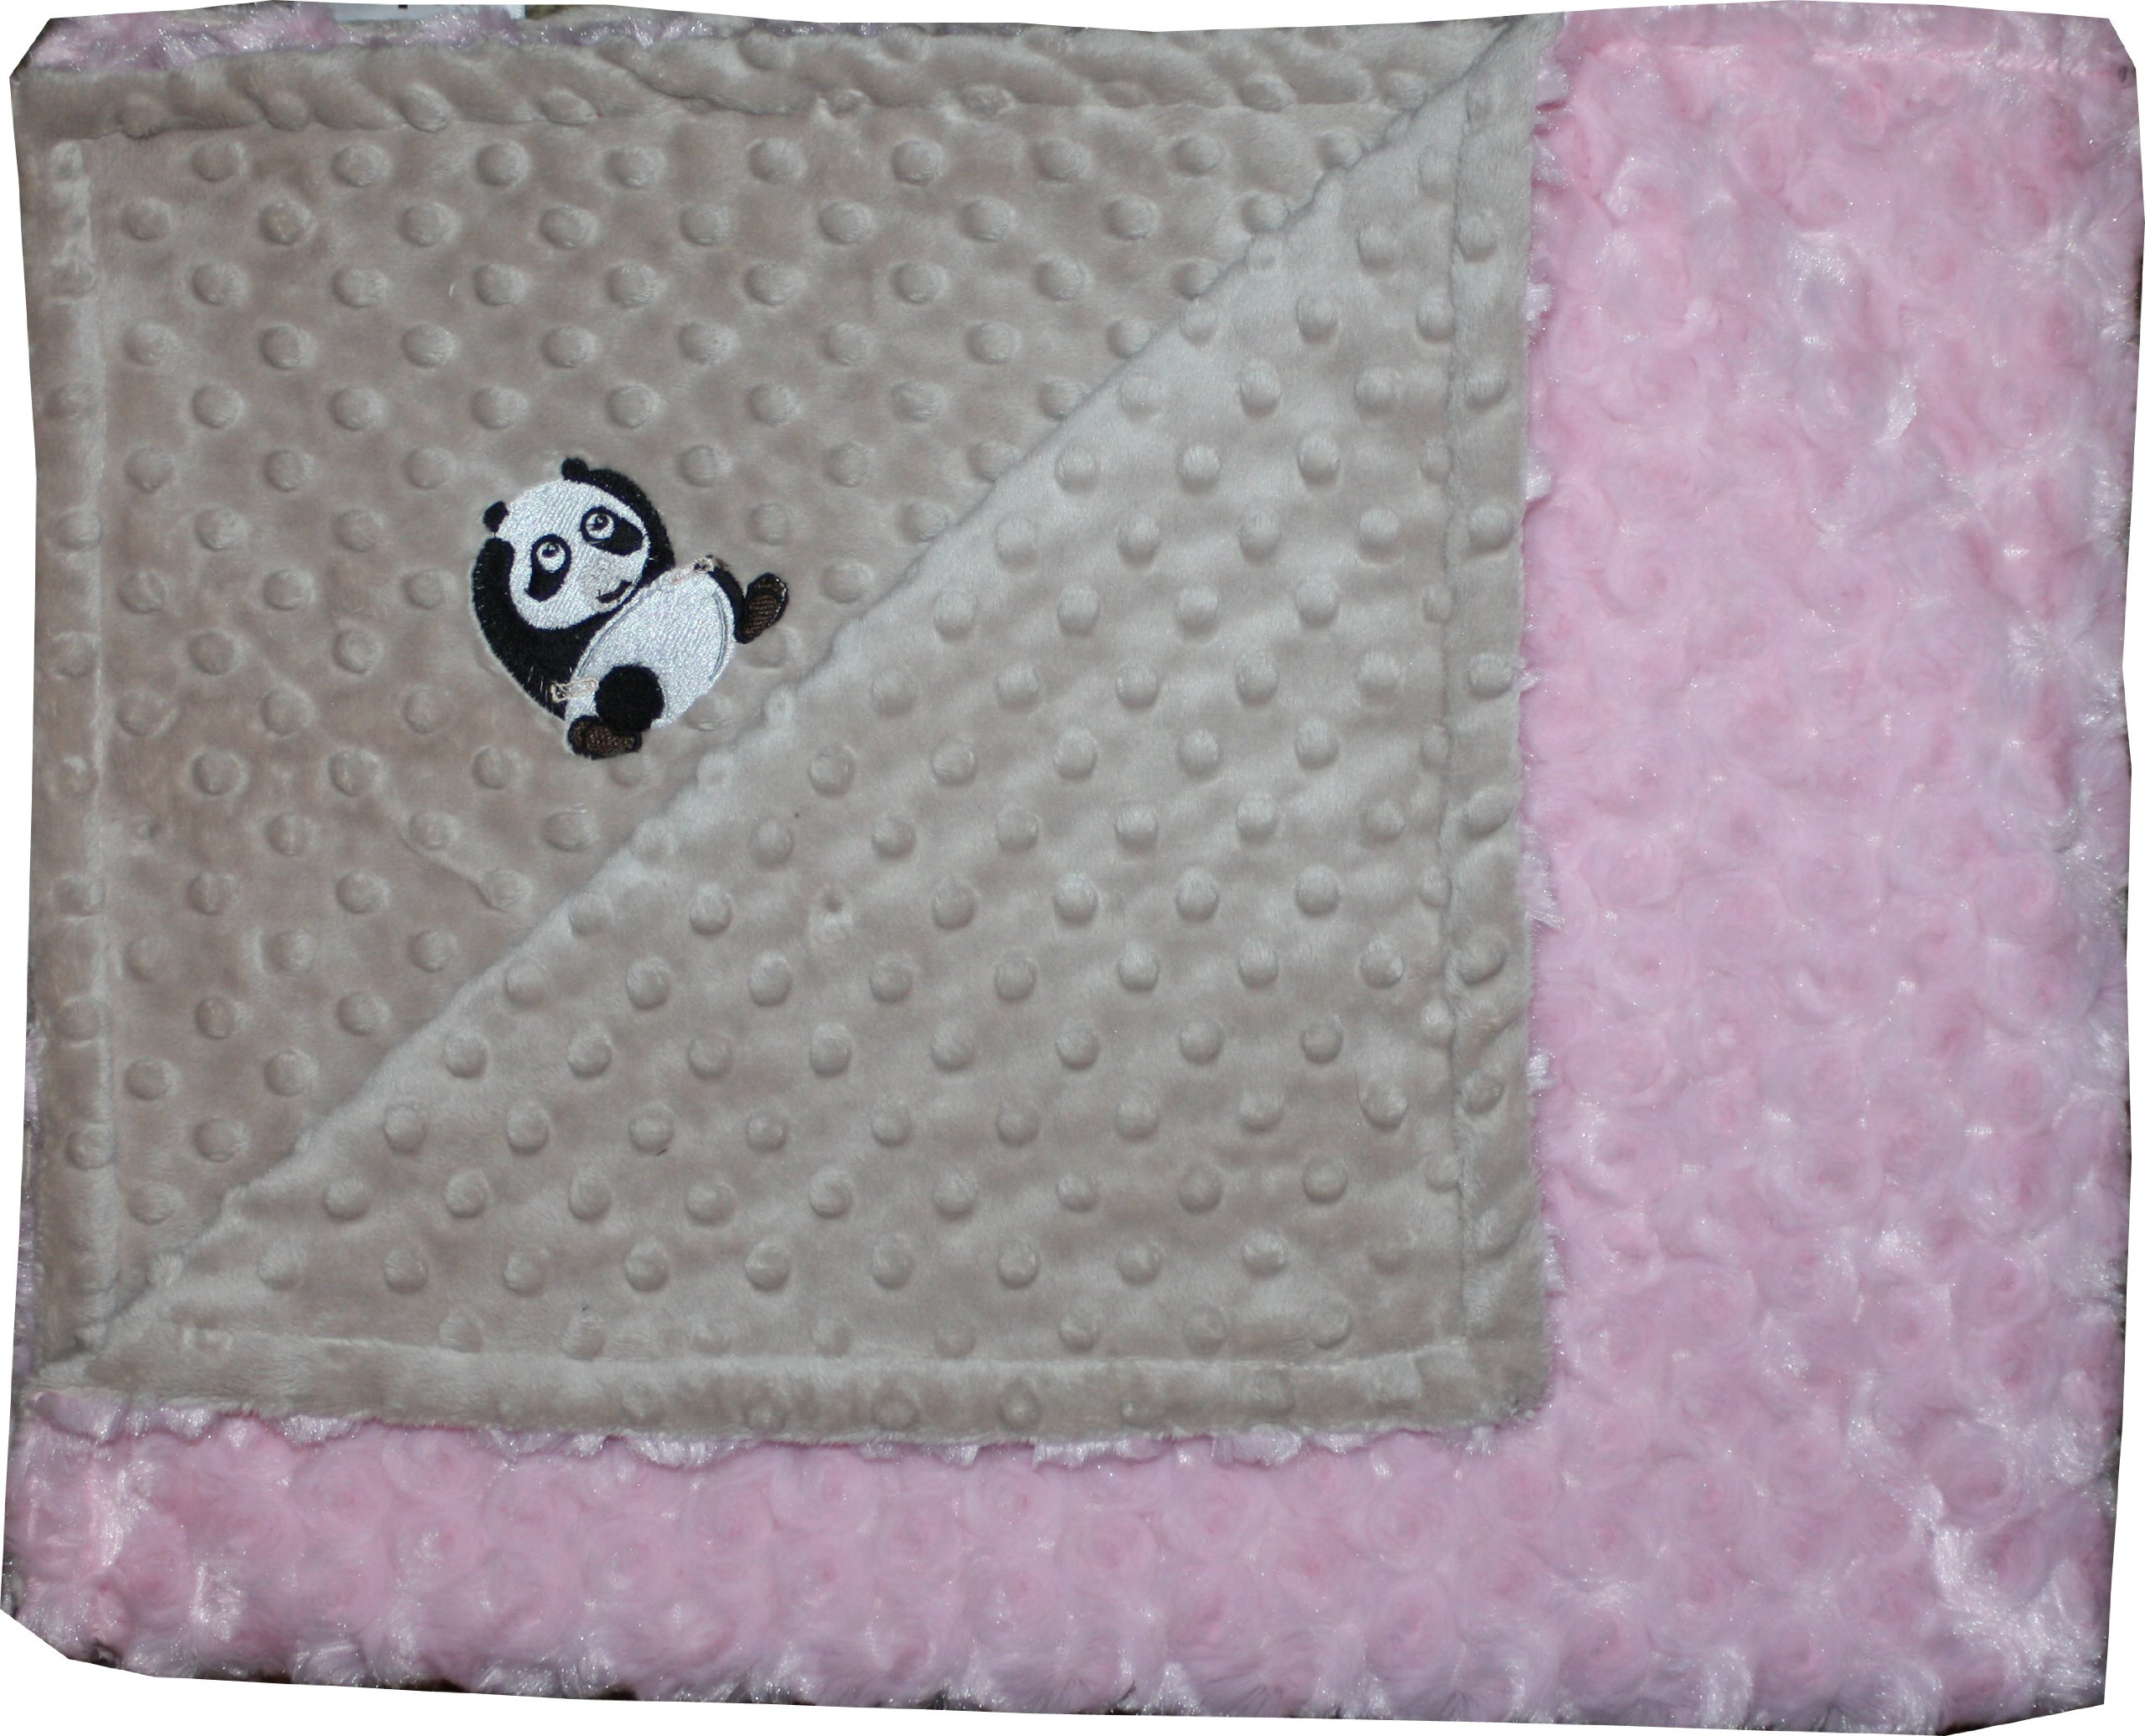 Lil' Cub Hub Minky Blanket, Mocha Dot/Pink Rosebud, Panda